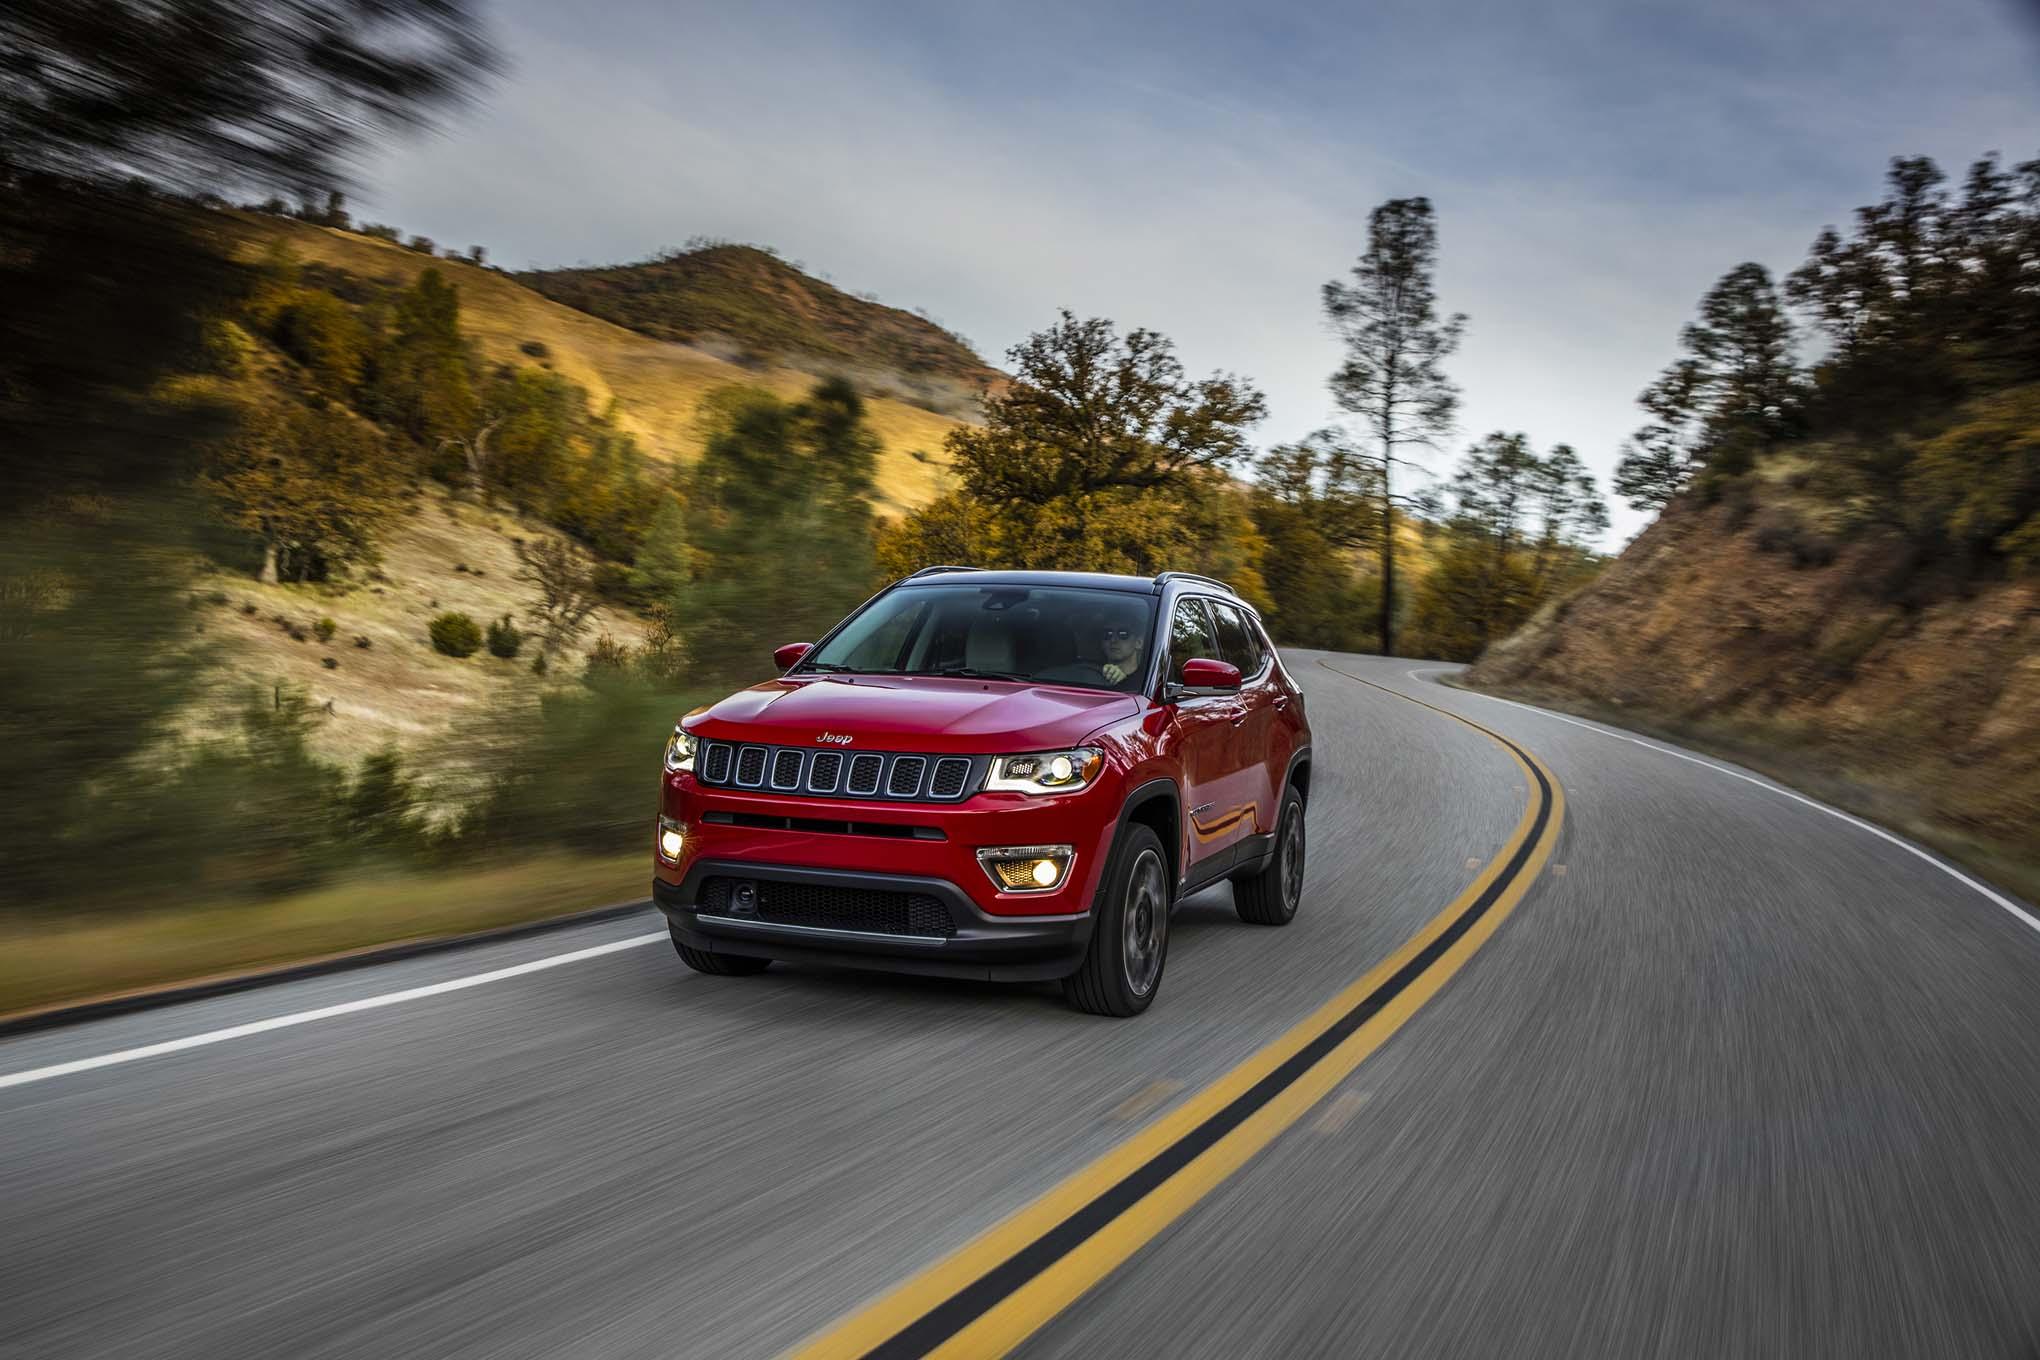 2017 jeep compass first drive automobile magazine. Black Bedroom Furniture Sets. Home Design Ideas